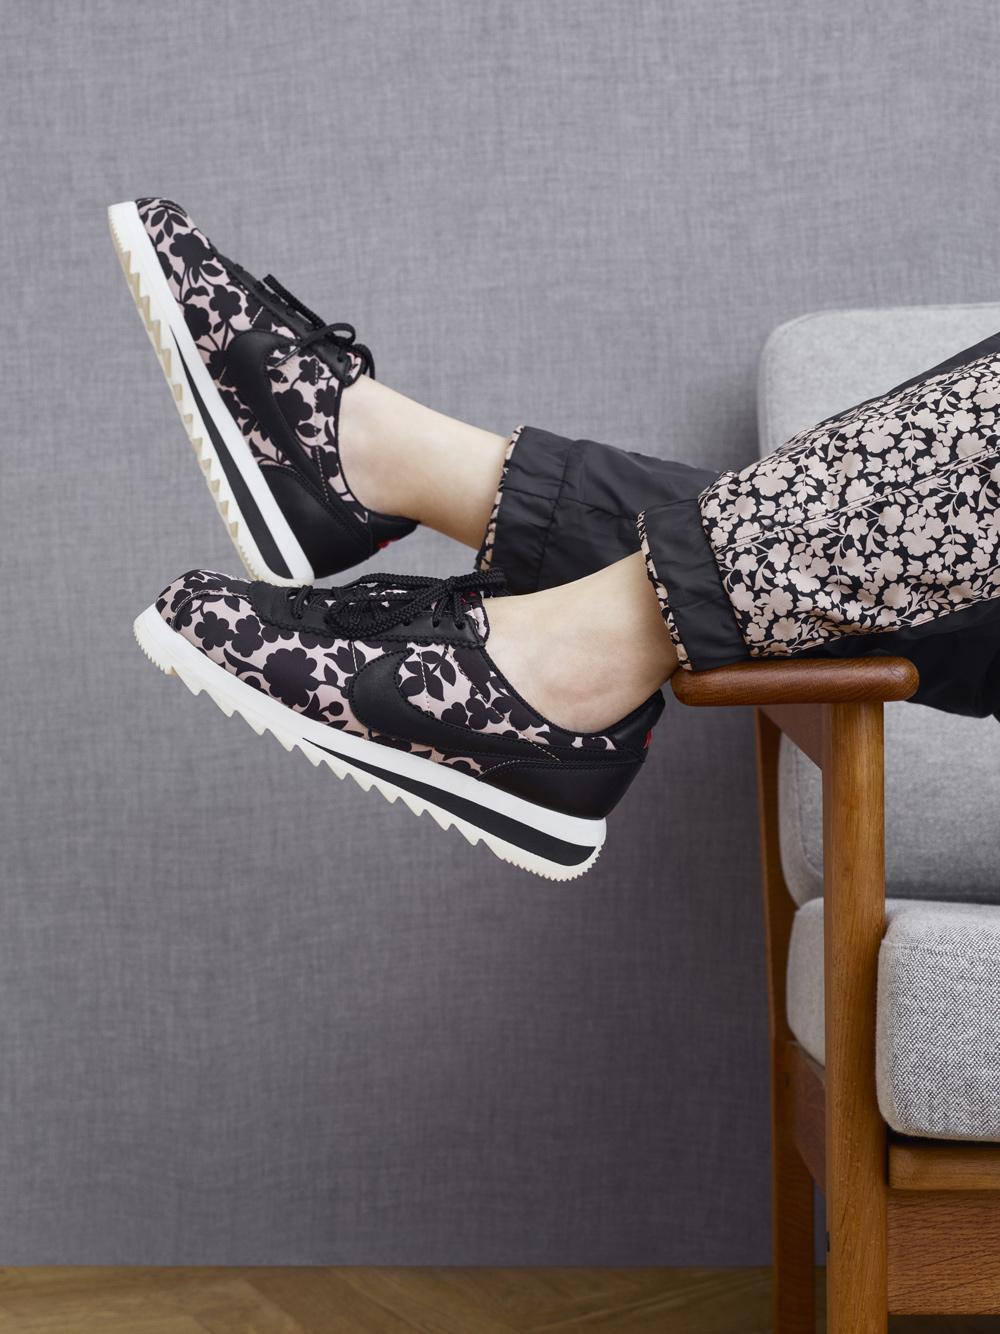 on sale 0ab3b 697d0 Liberty of London x Nike WMNS